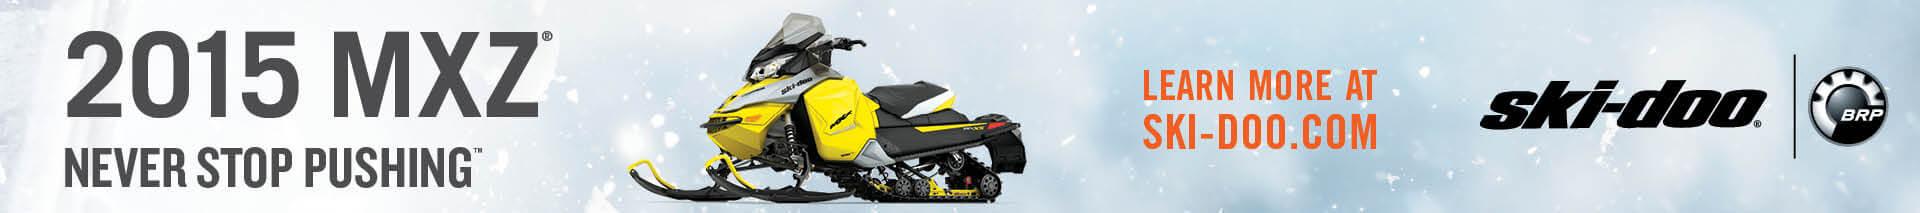 4-ski-doo-banner